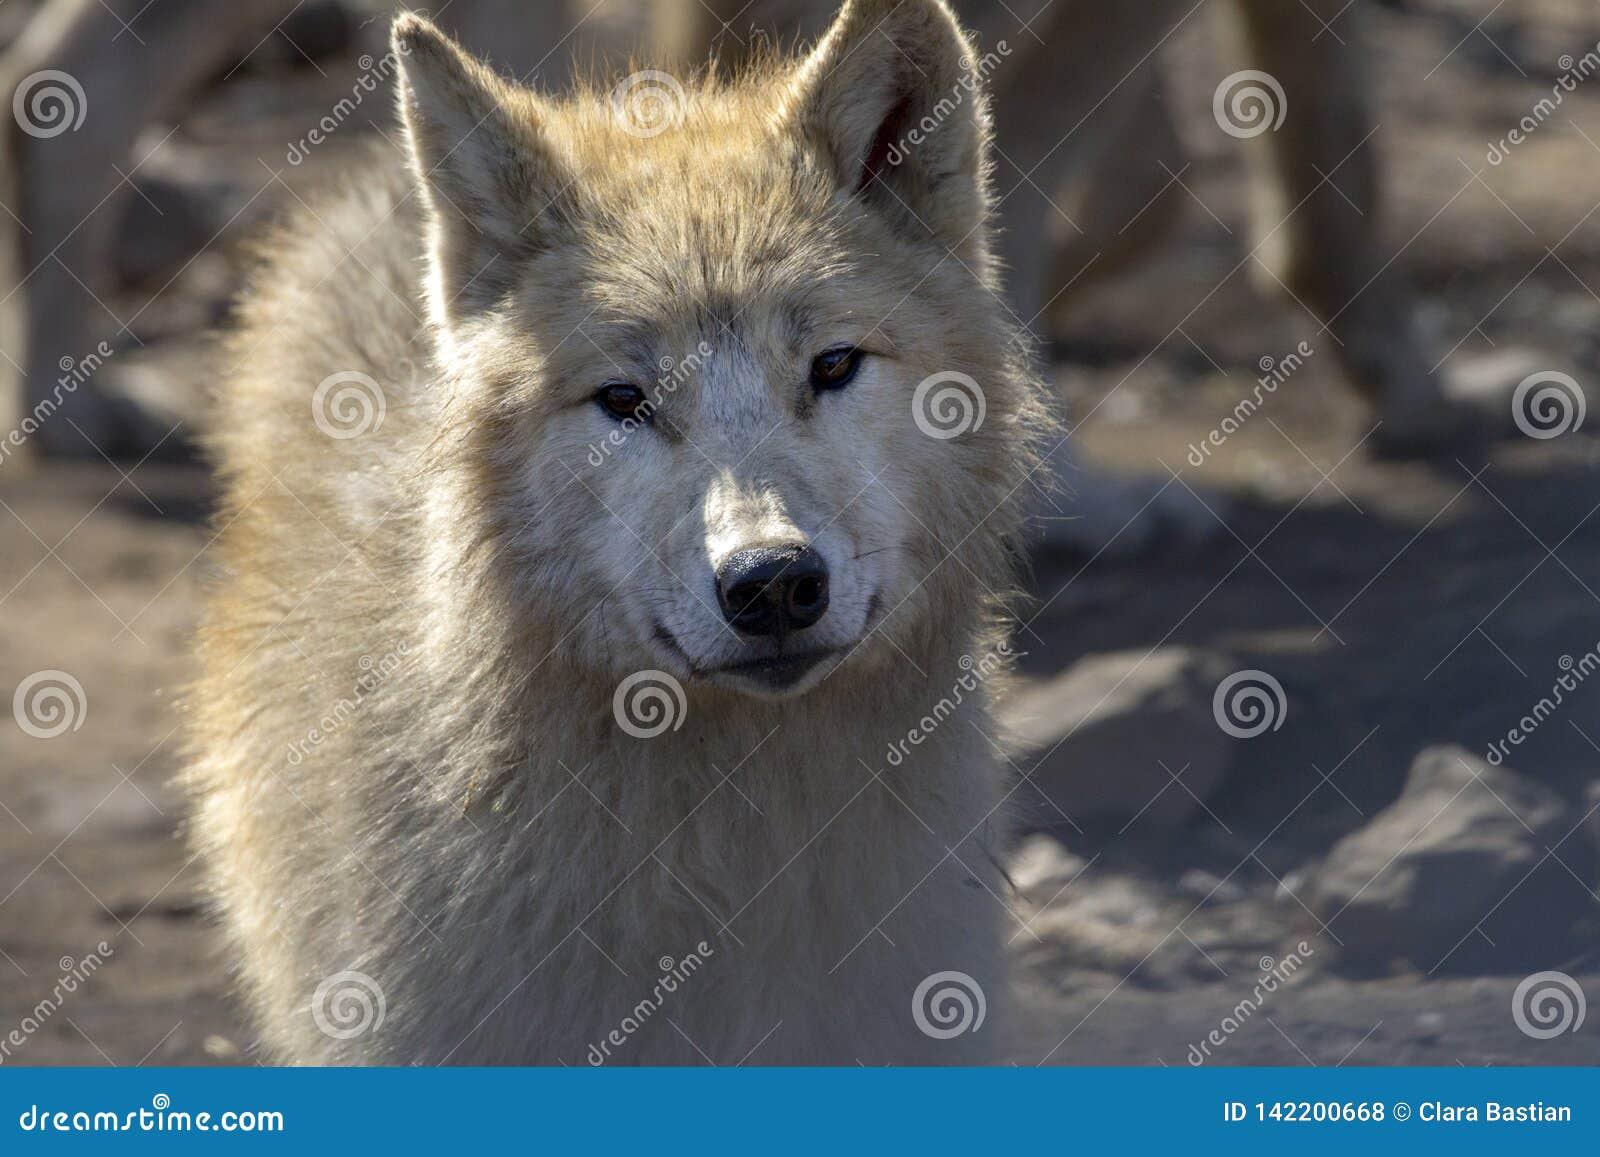 Close up portrait of a wolf.